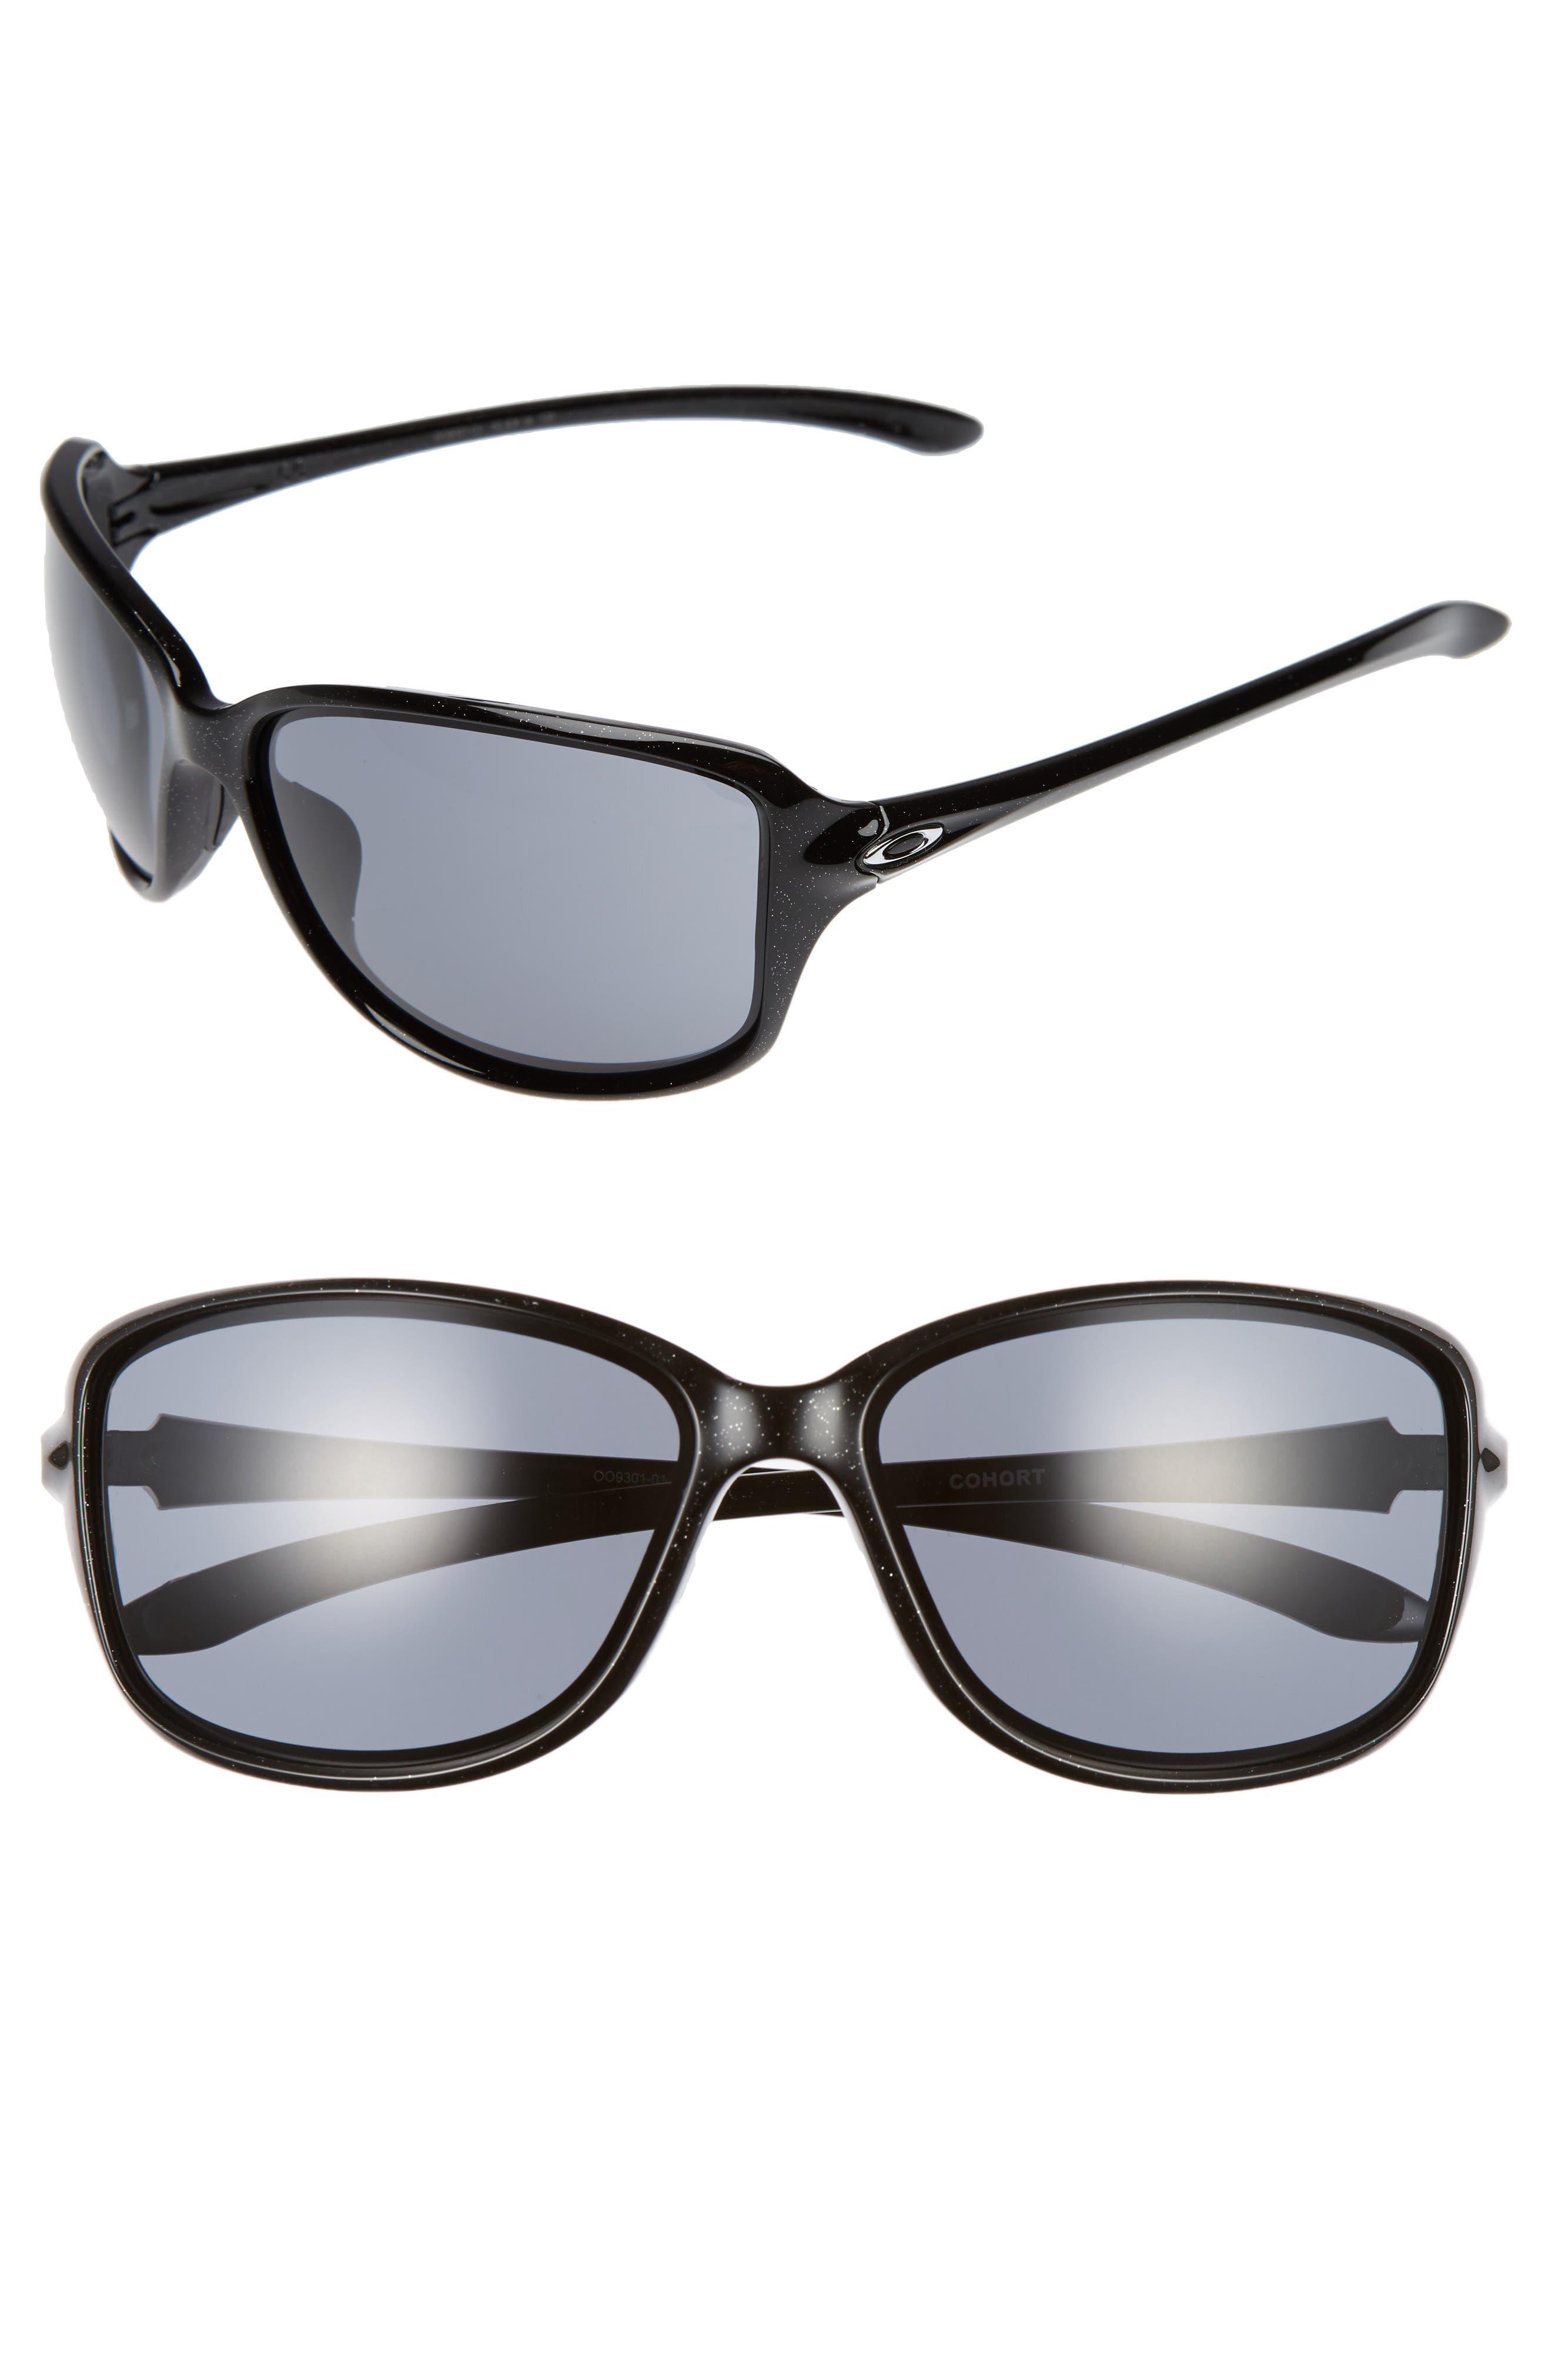 Cohort 62mm Sunglasses,                         Main,                         color, Metallic Black/ Grey